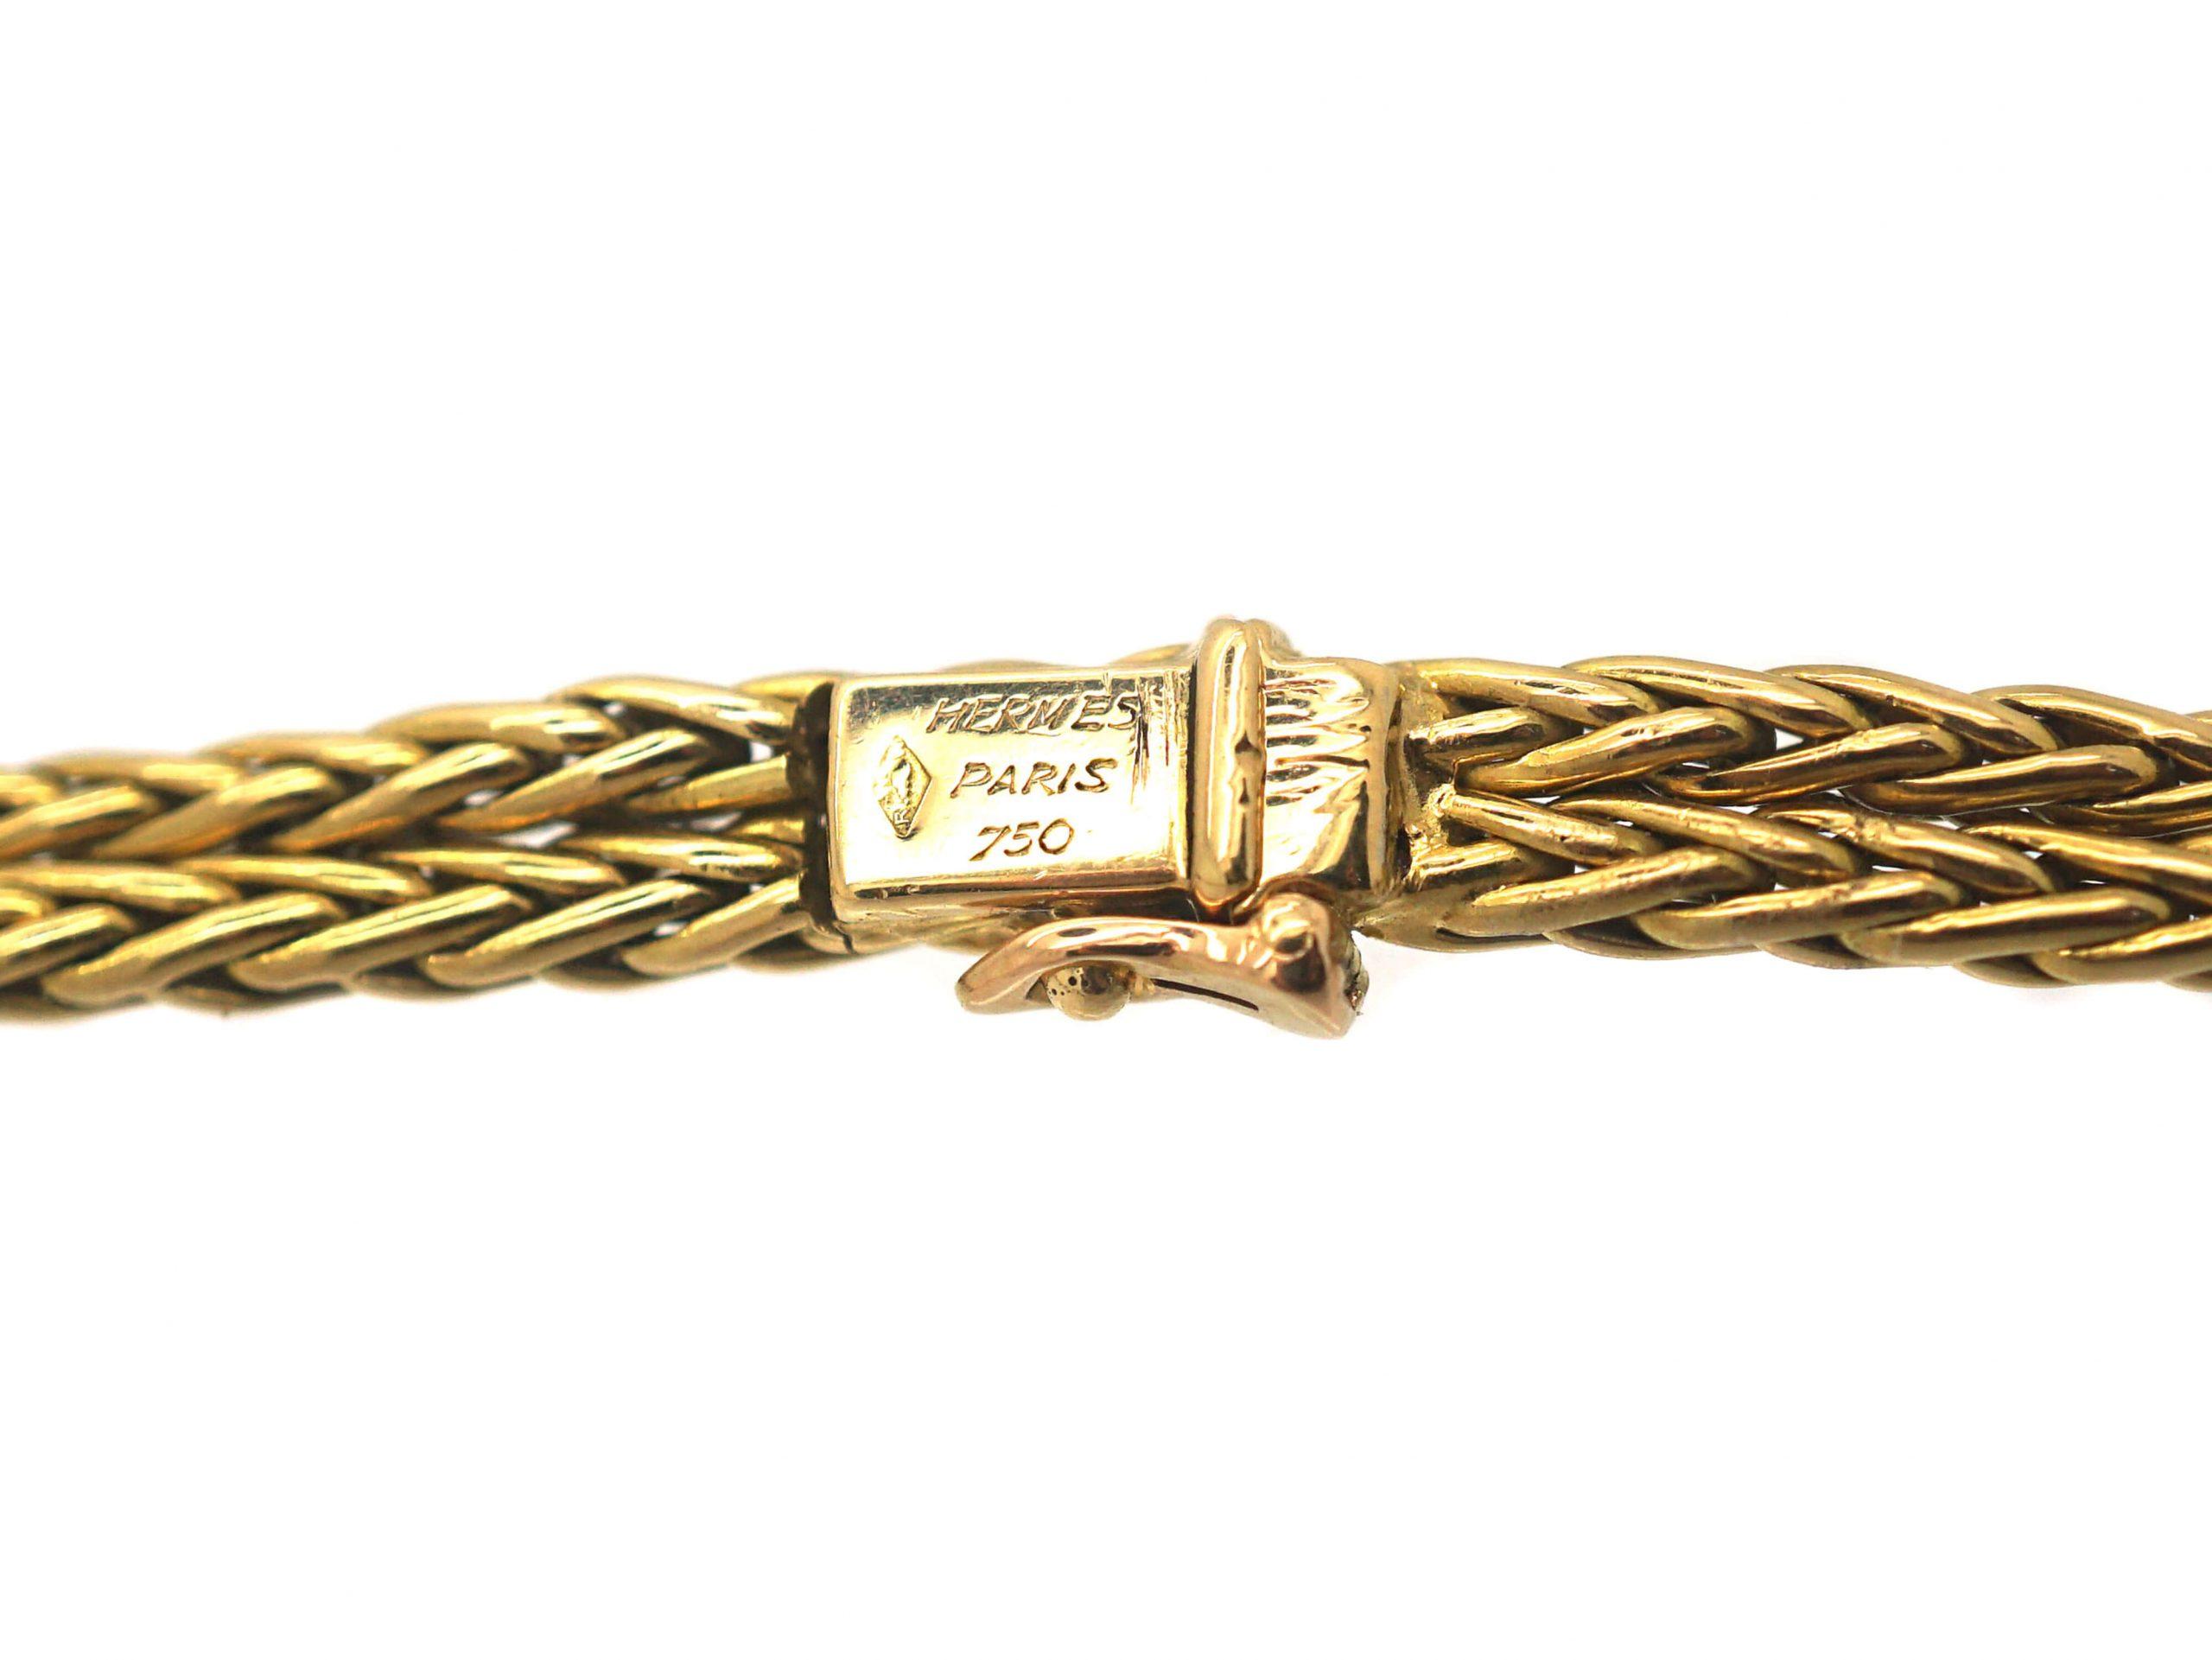 French 18ct Gold & Diamond Necklace by Hermès, Paris